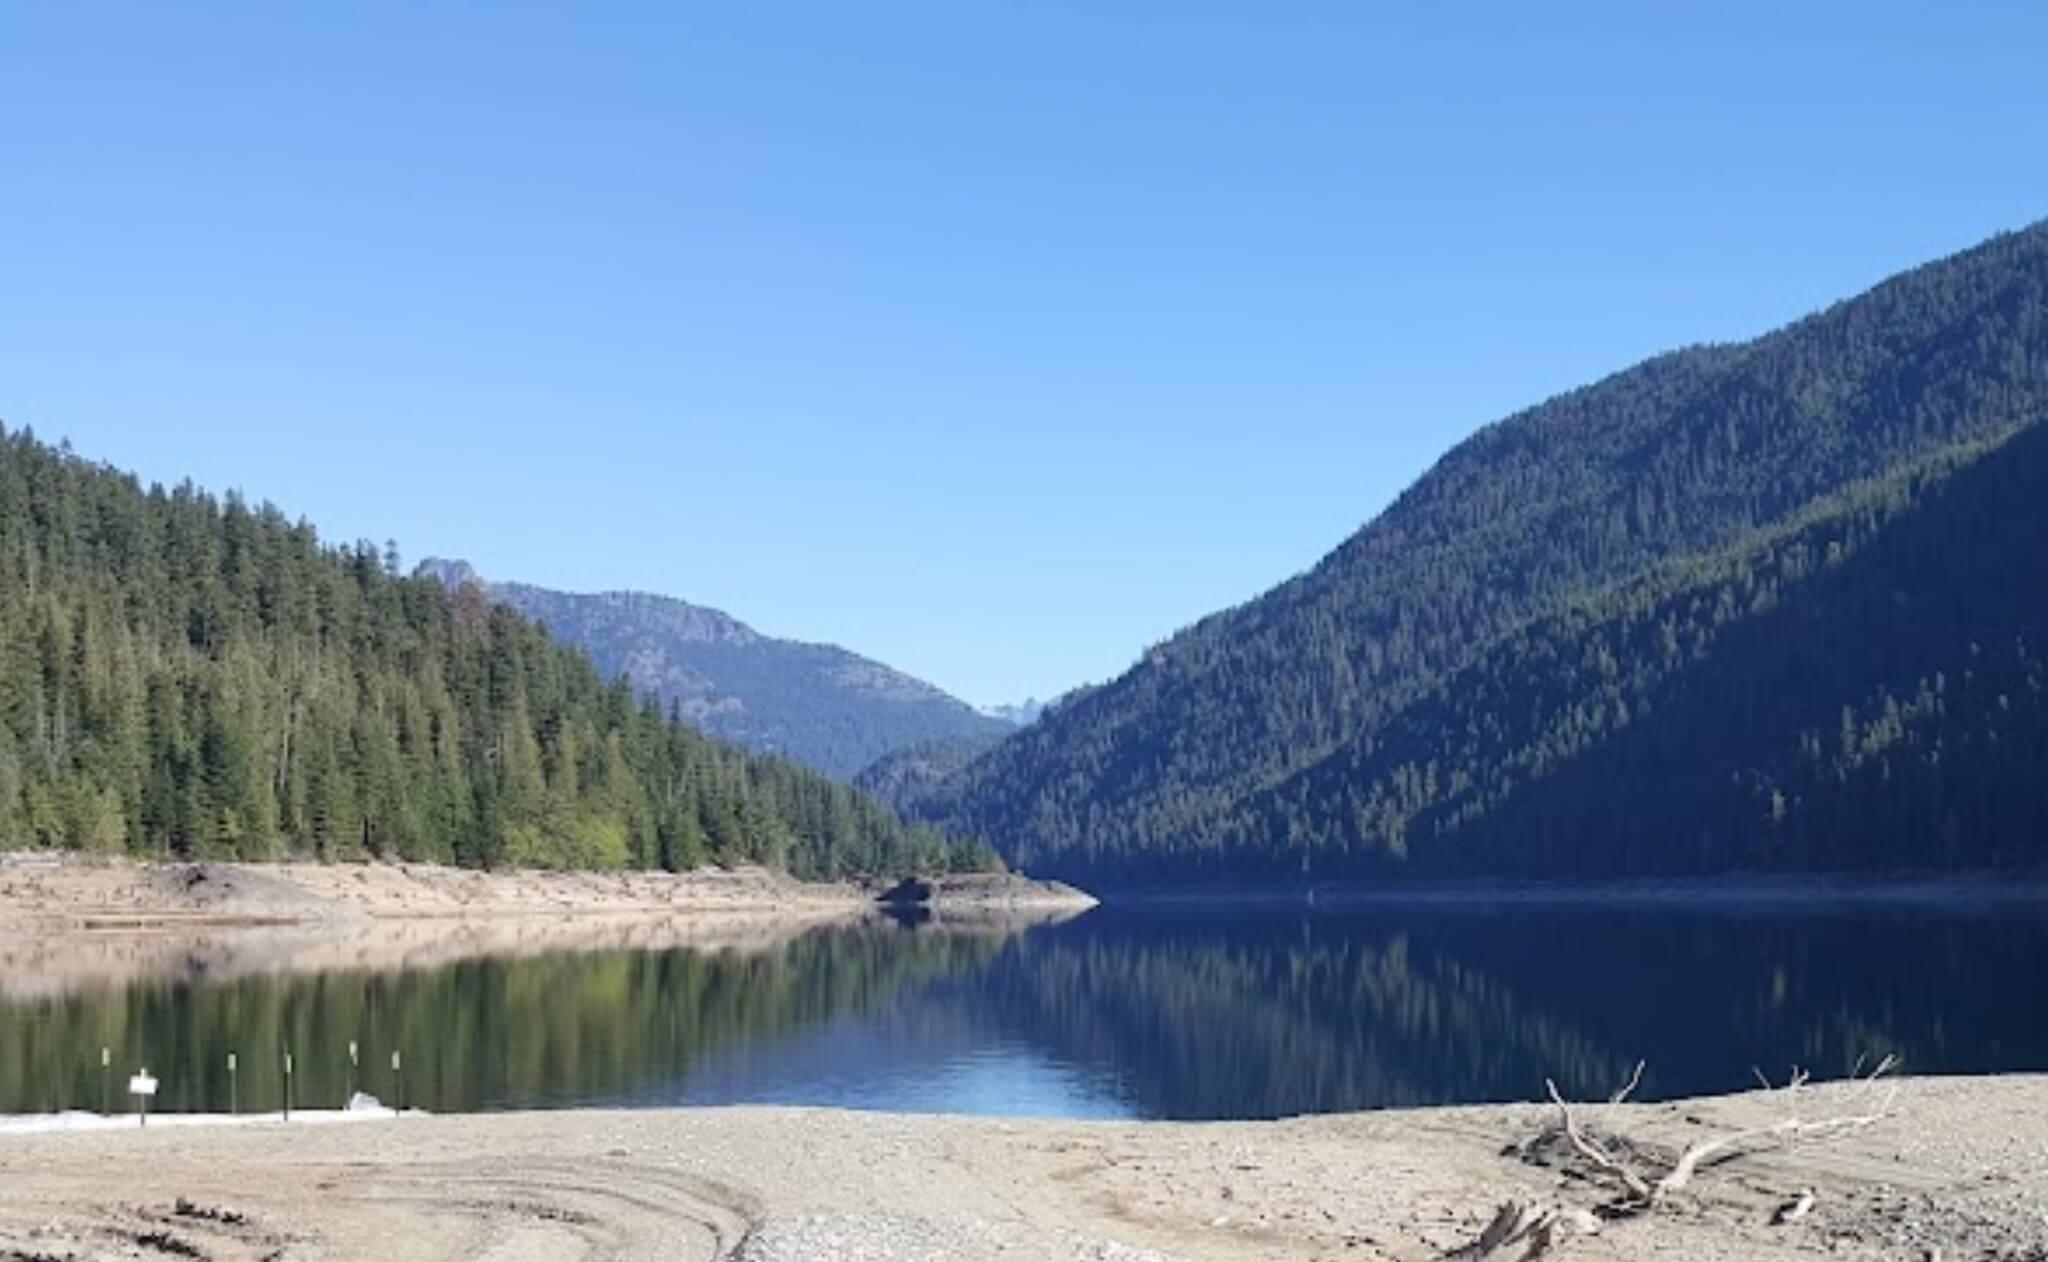 Kachess-Lake-Fishing-Report-Guide-Washington-WA-03